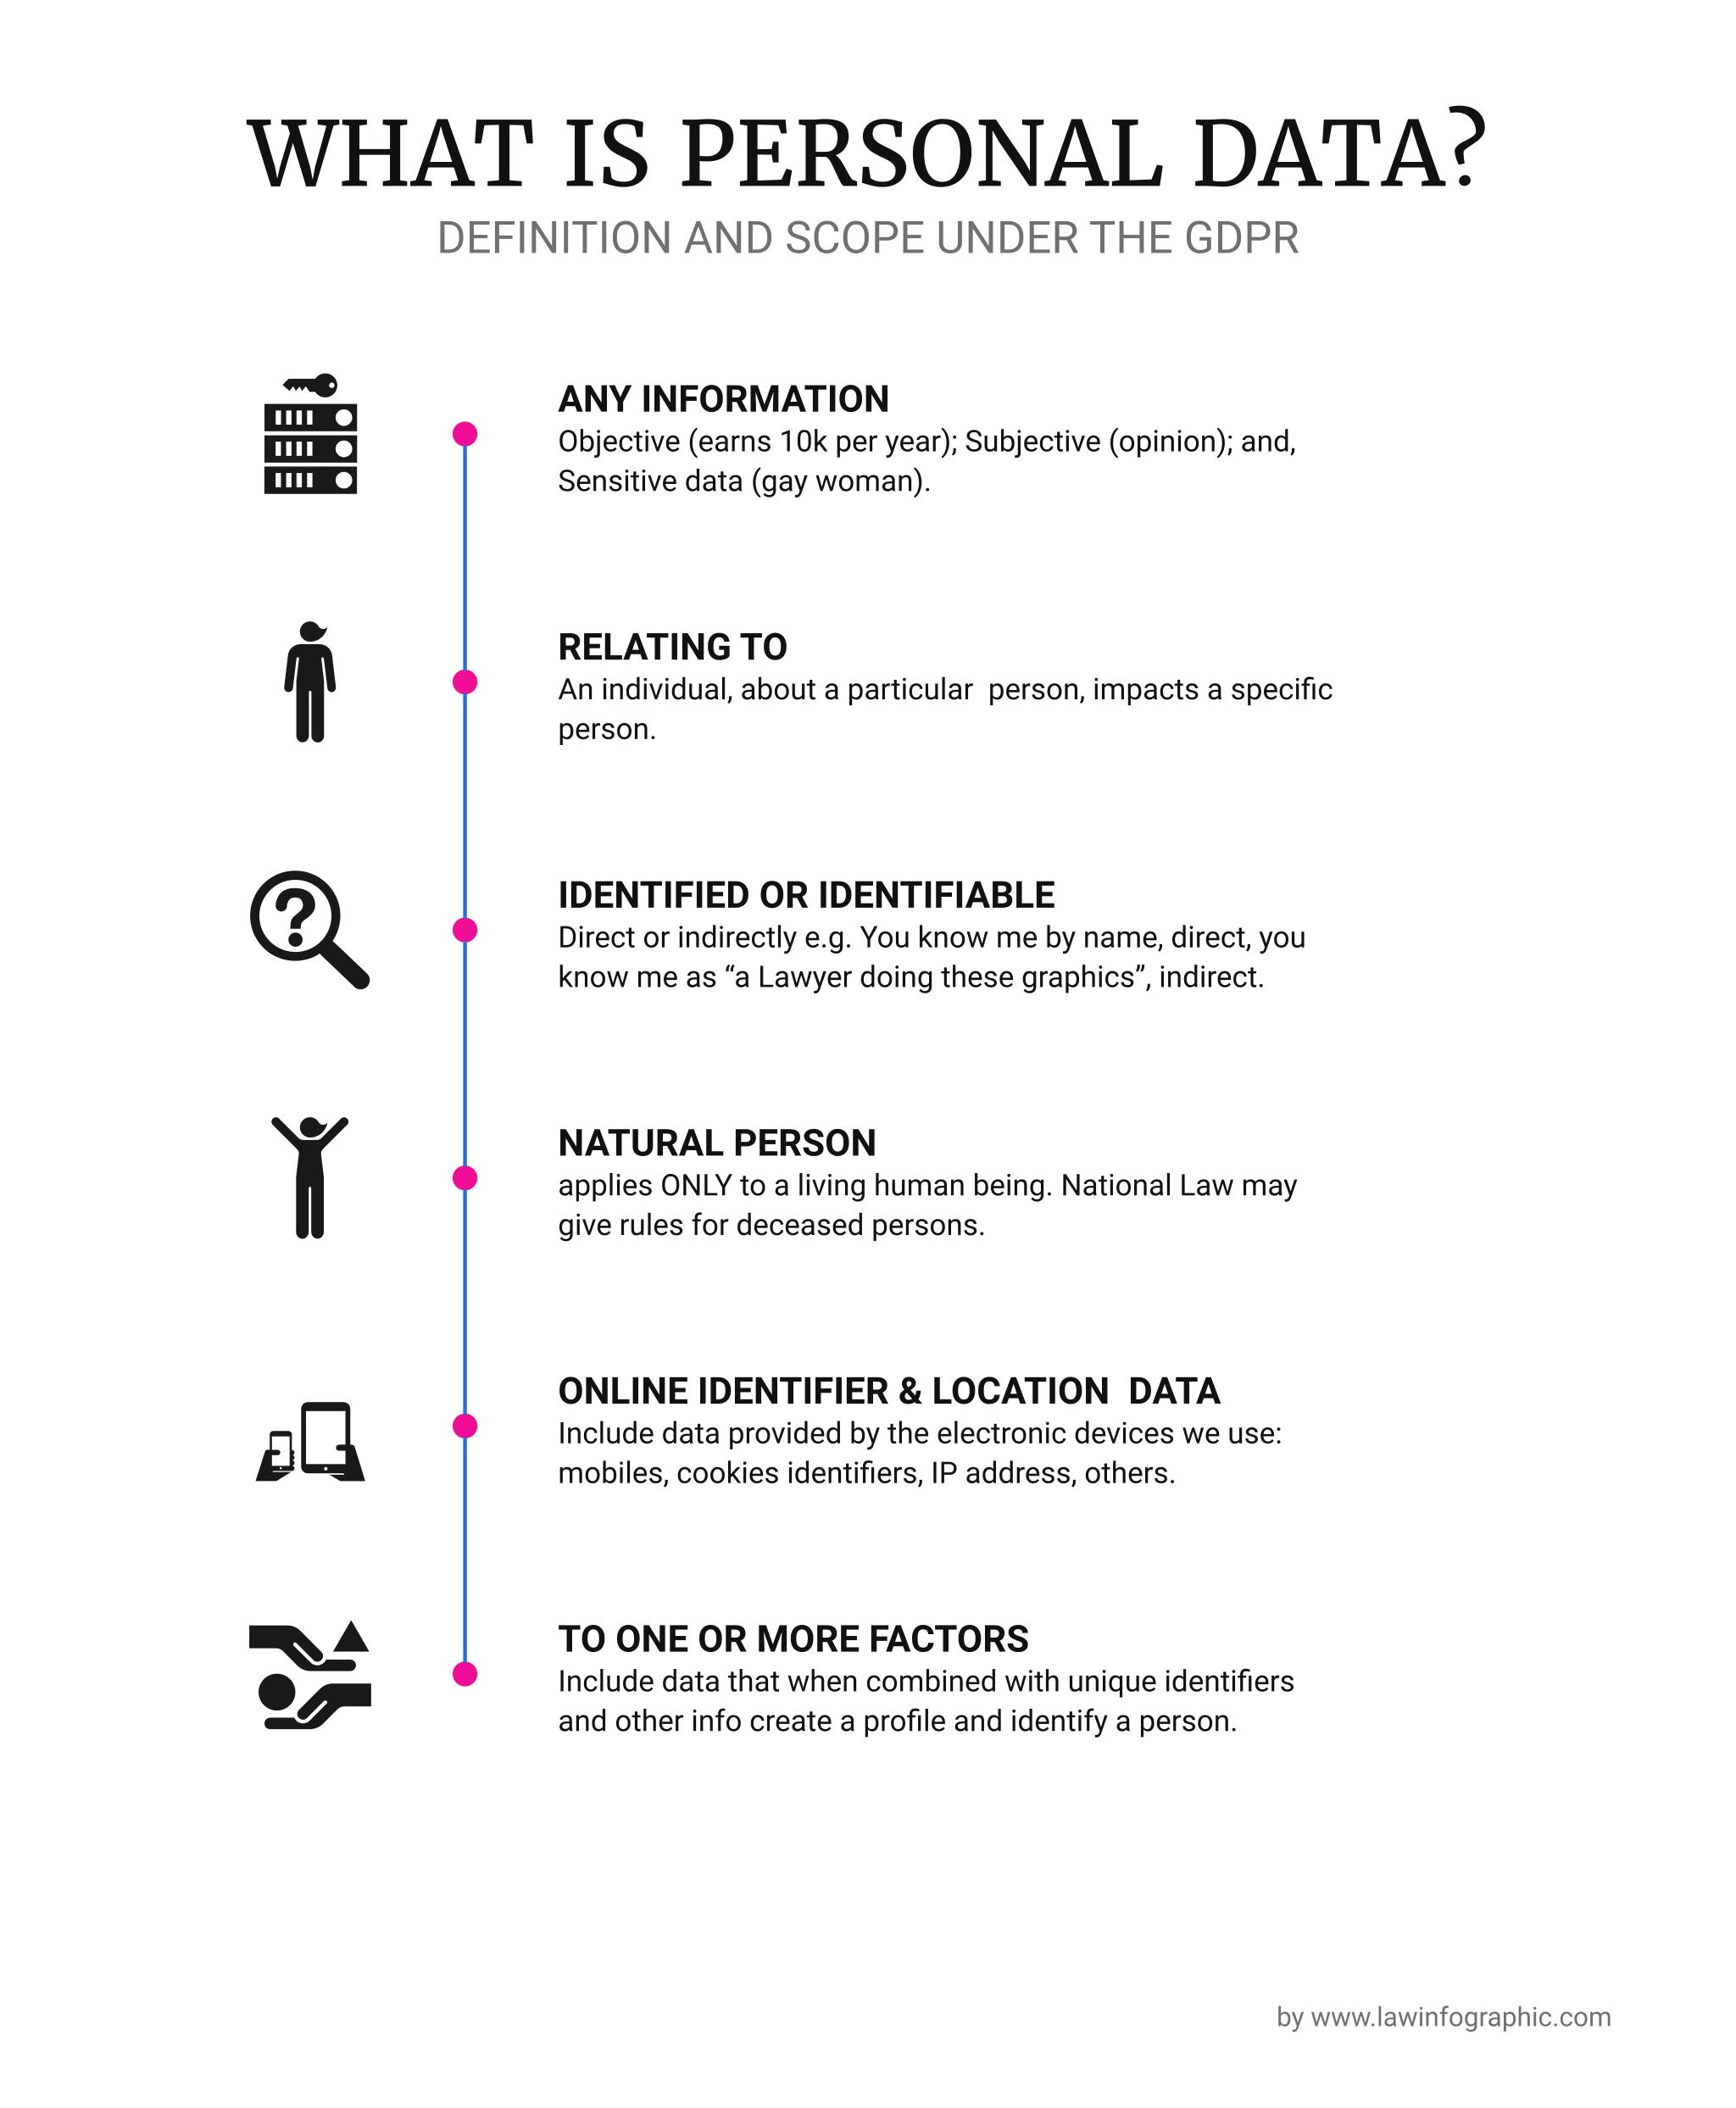 What Is Personal Data Law Infographic Computertips Monografia Seguranca Tecnologia